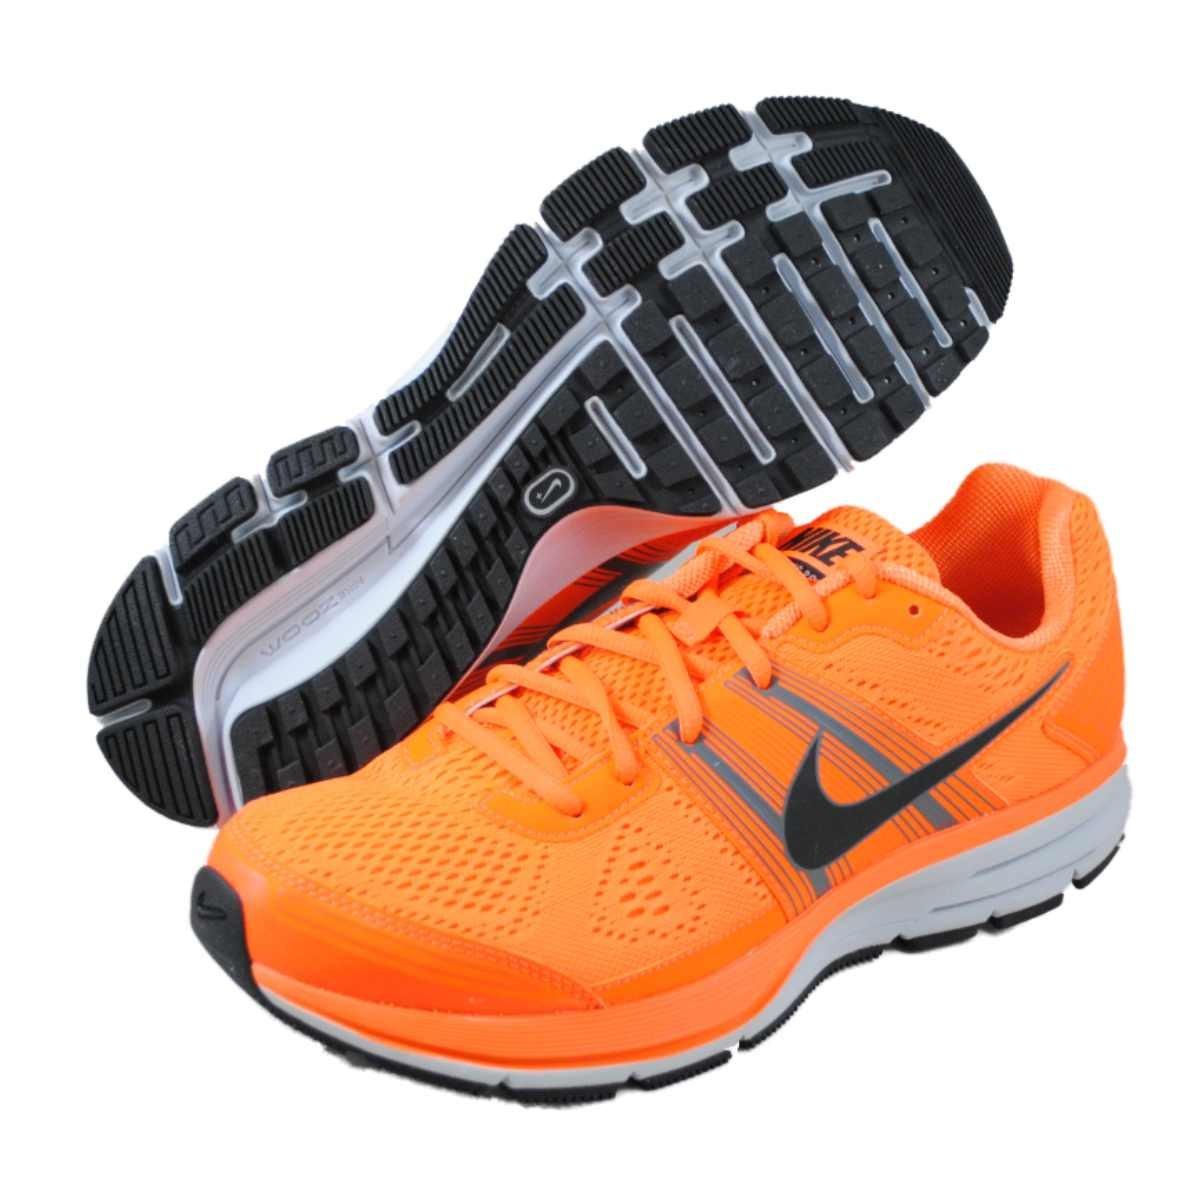 size 40 7b0cd 350d9 Nike - Air Pegasus+ 29 Uomo, (Total OrangeBlack-Dark Grey-Pure Platinum),  43.5 EU Amazon.it Scarpe e borse